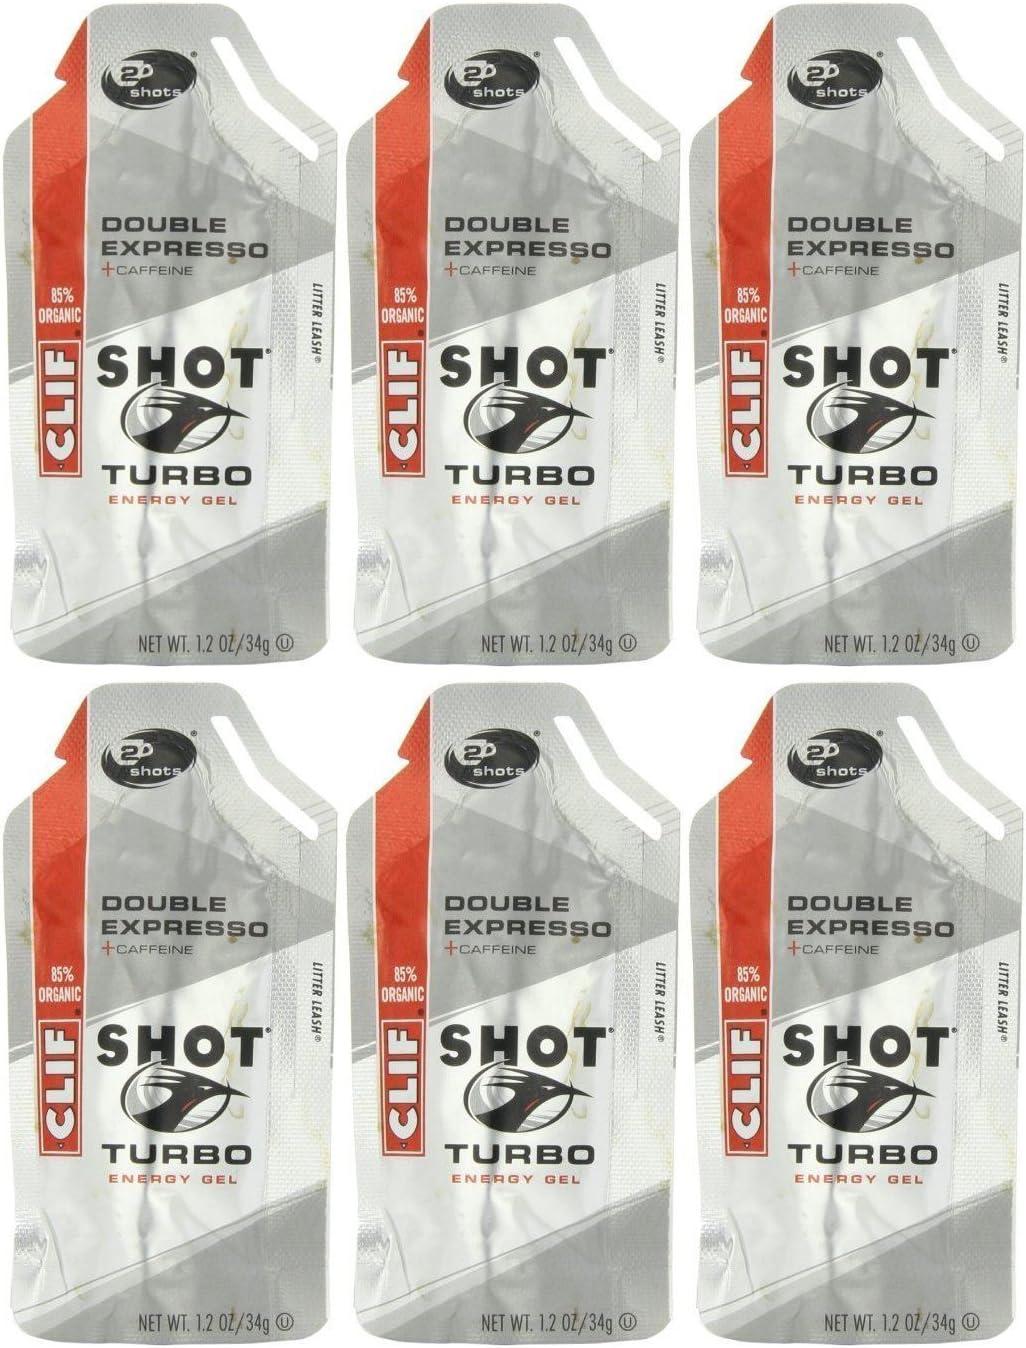 Clif Shot Gel - Double Expresso - 6 Pack (6 x 1.2oz Packs)